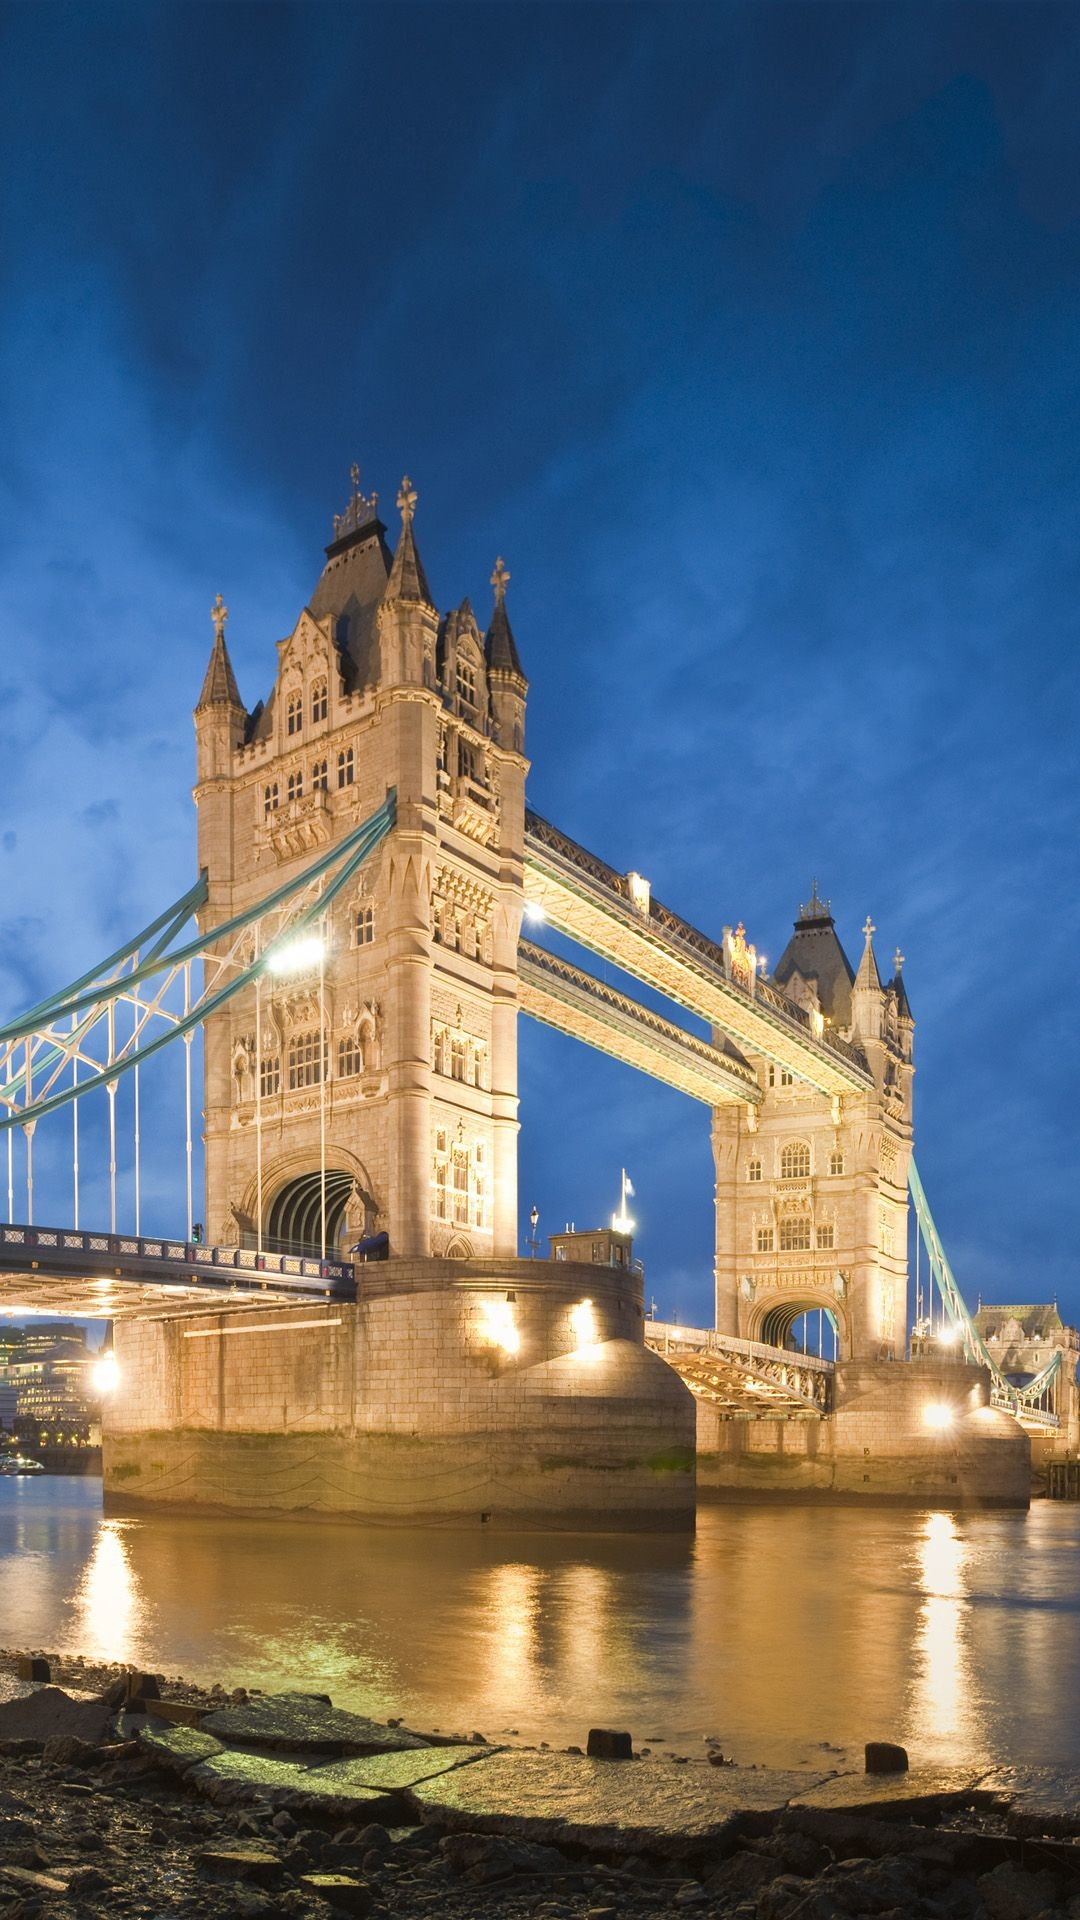 Res: 1080x1920, England London Bridge iphone 6 plus Wallpapers, iPhone 6 Plus